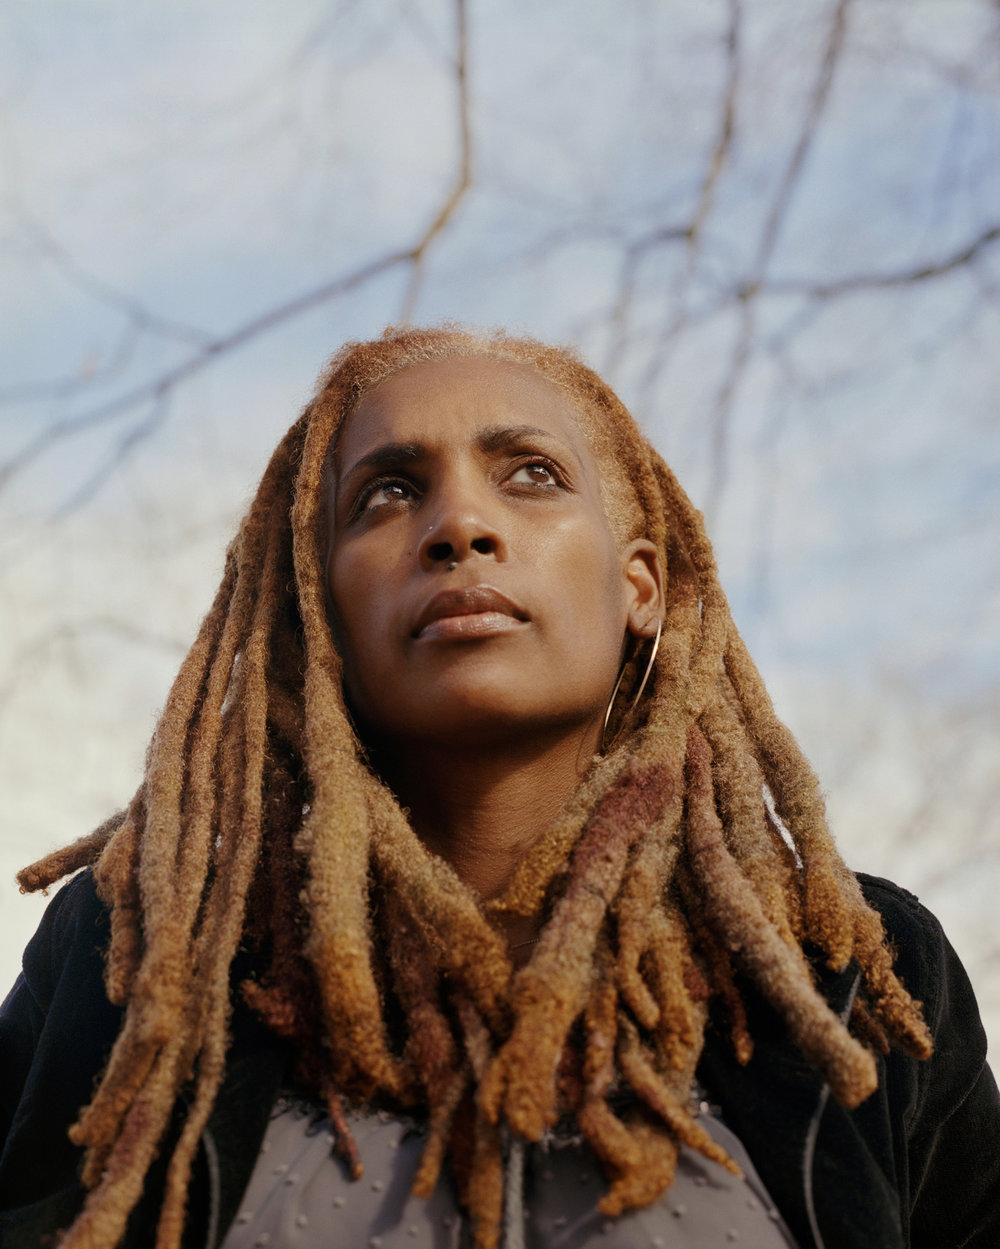 Kenyette Barnes, Co-founder of #MuteRKelly Movement, Atlanta